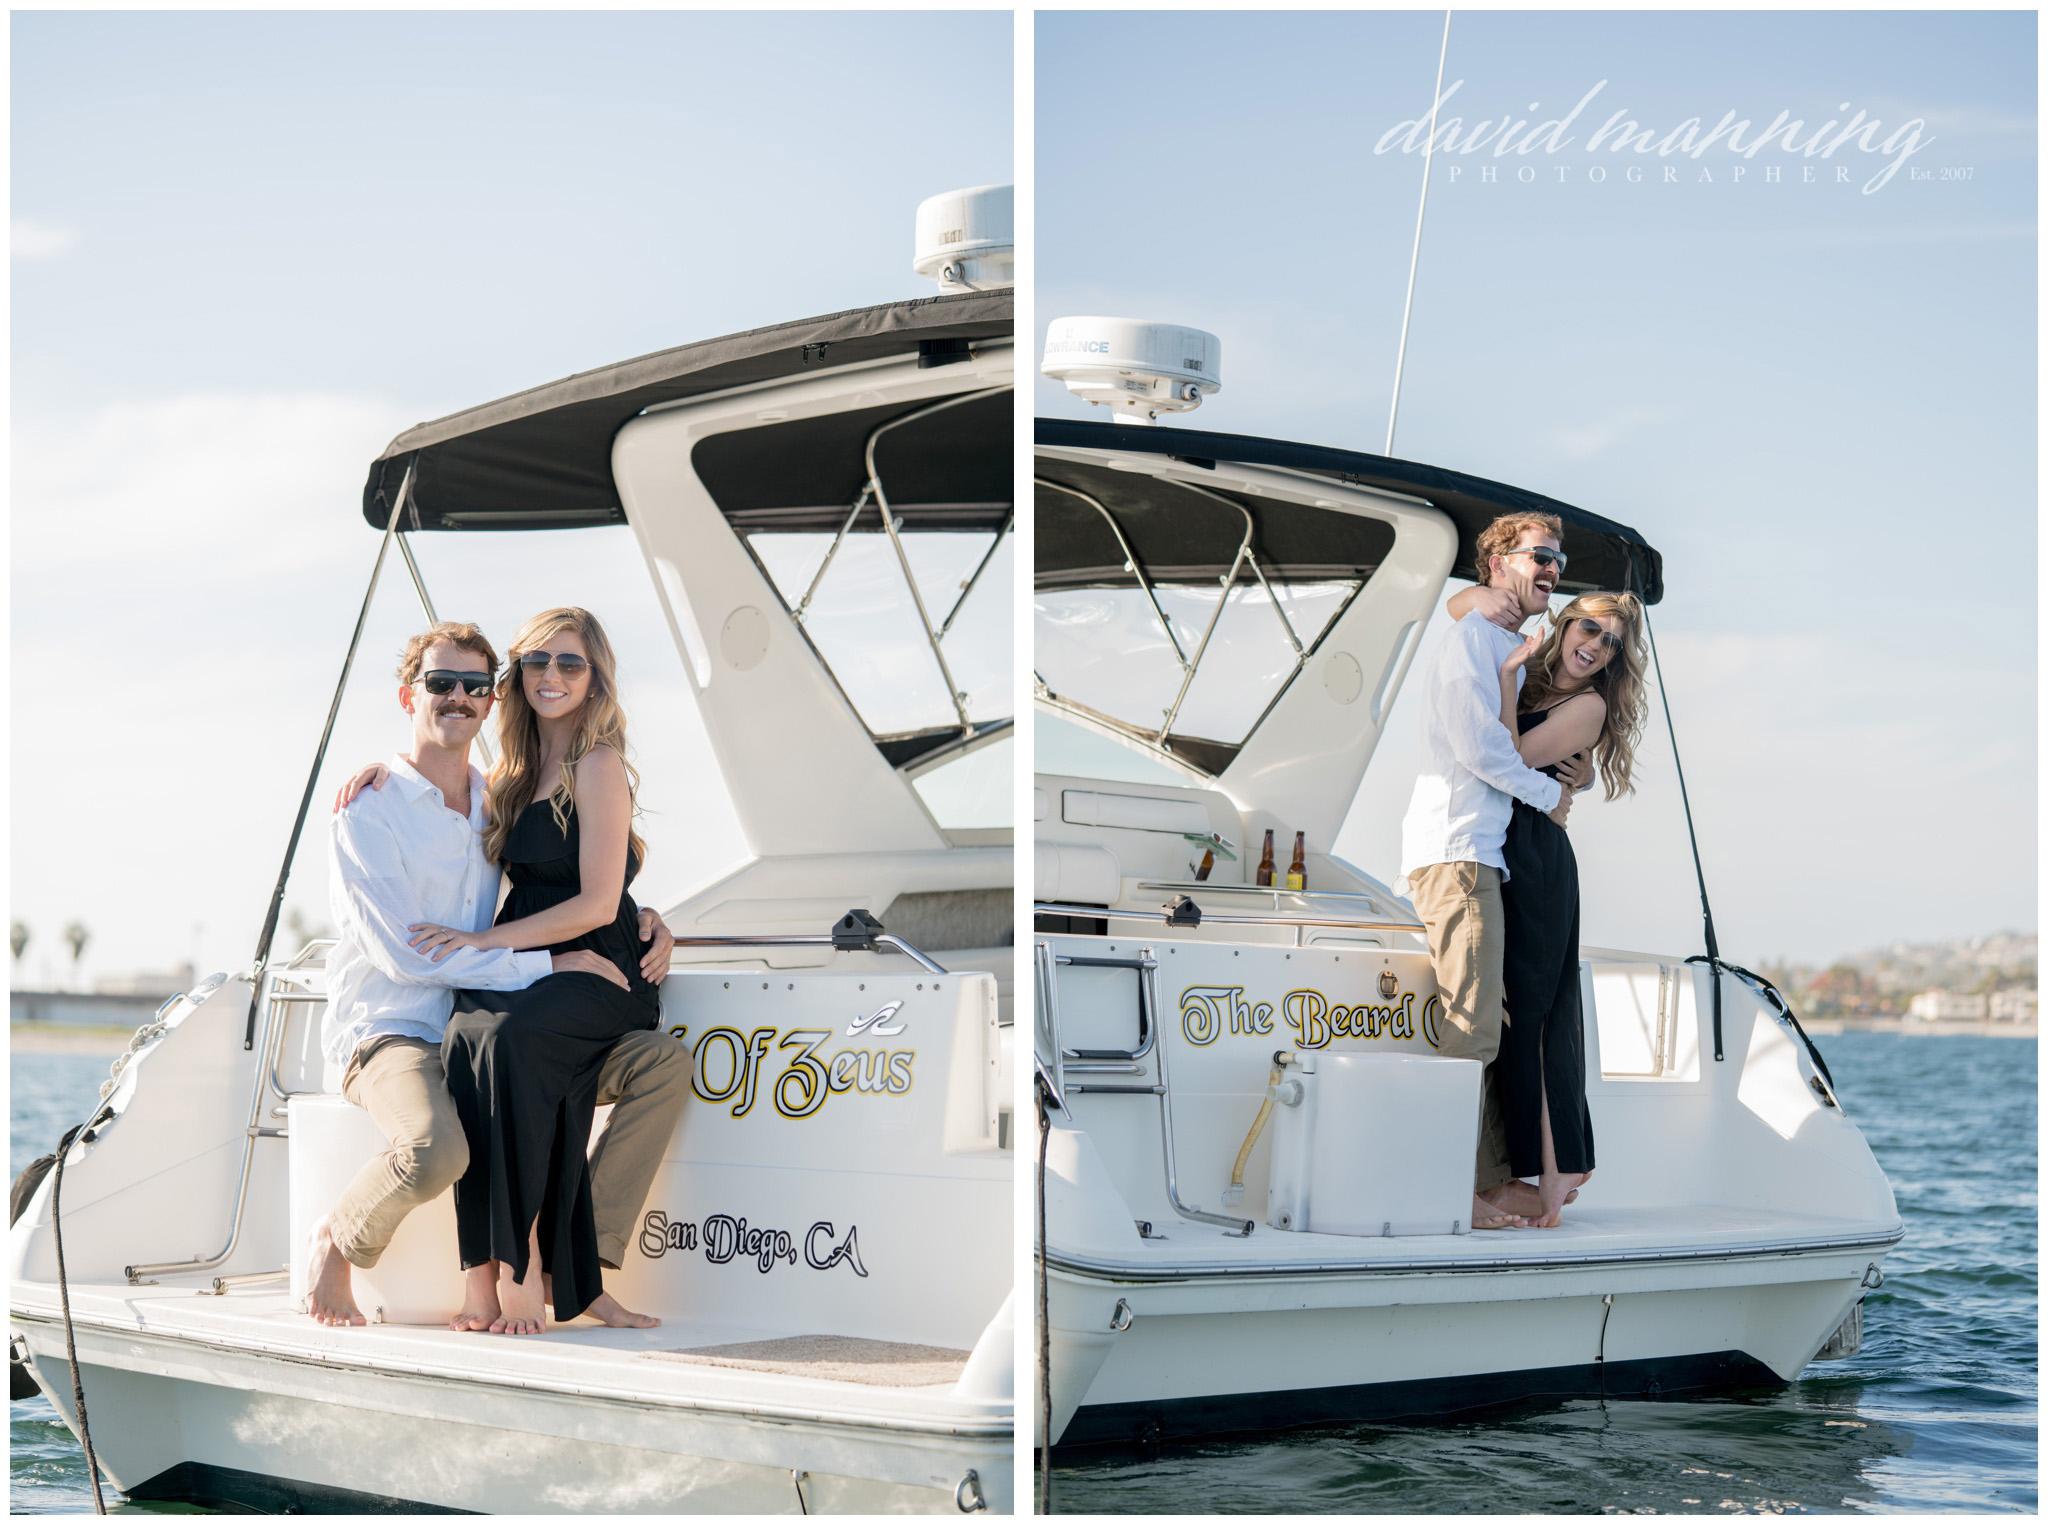 Alyssa-Taylor-Engagement-David-Manning-Photographer-0078.JPG